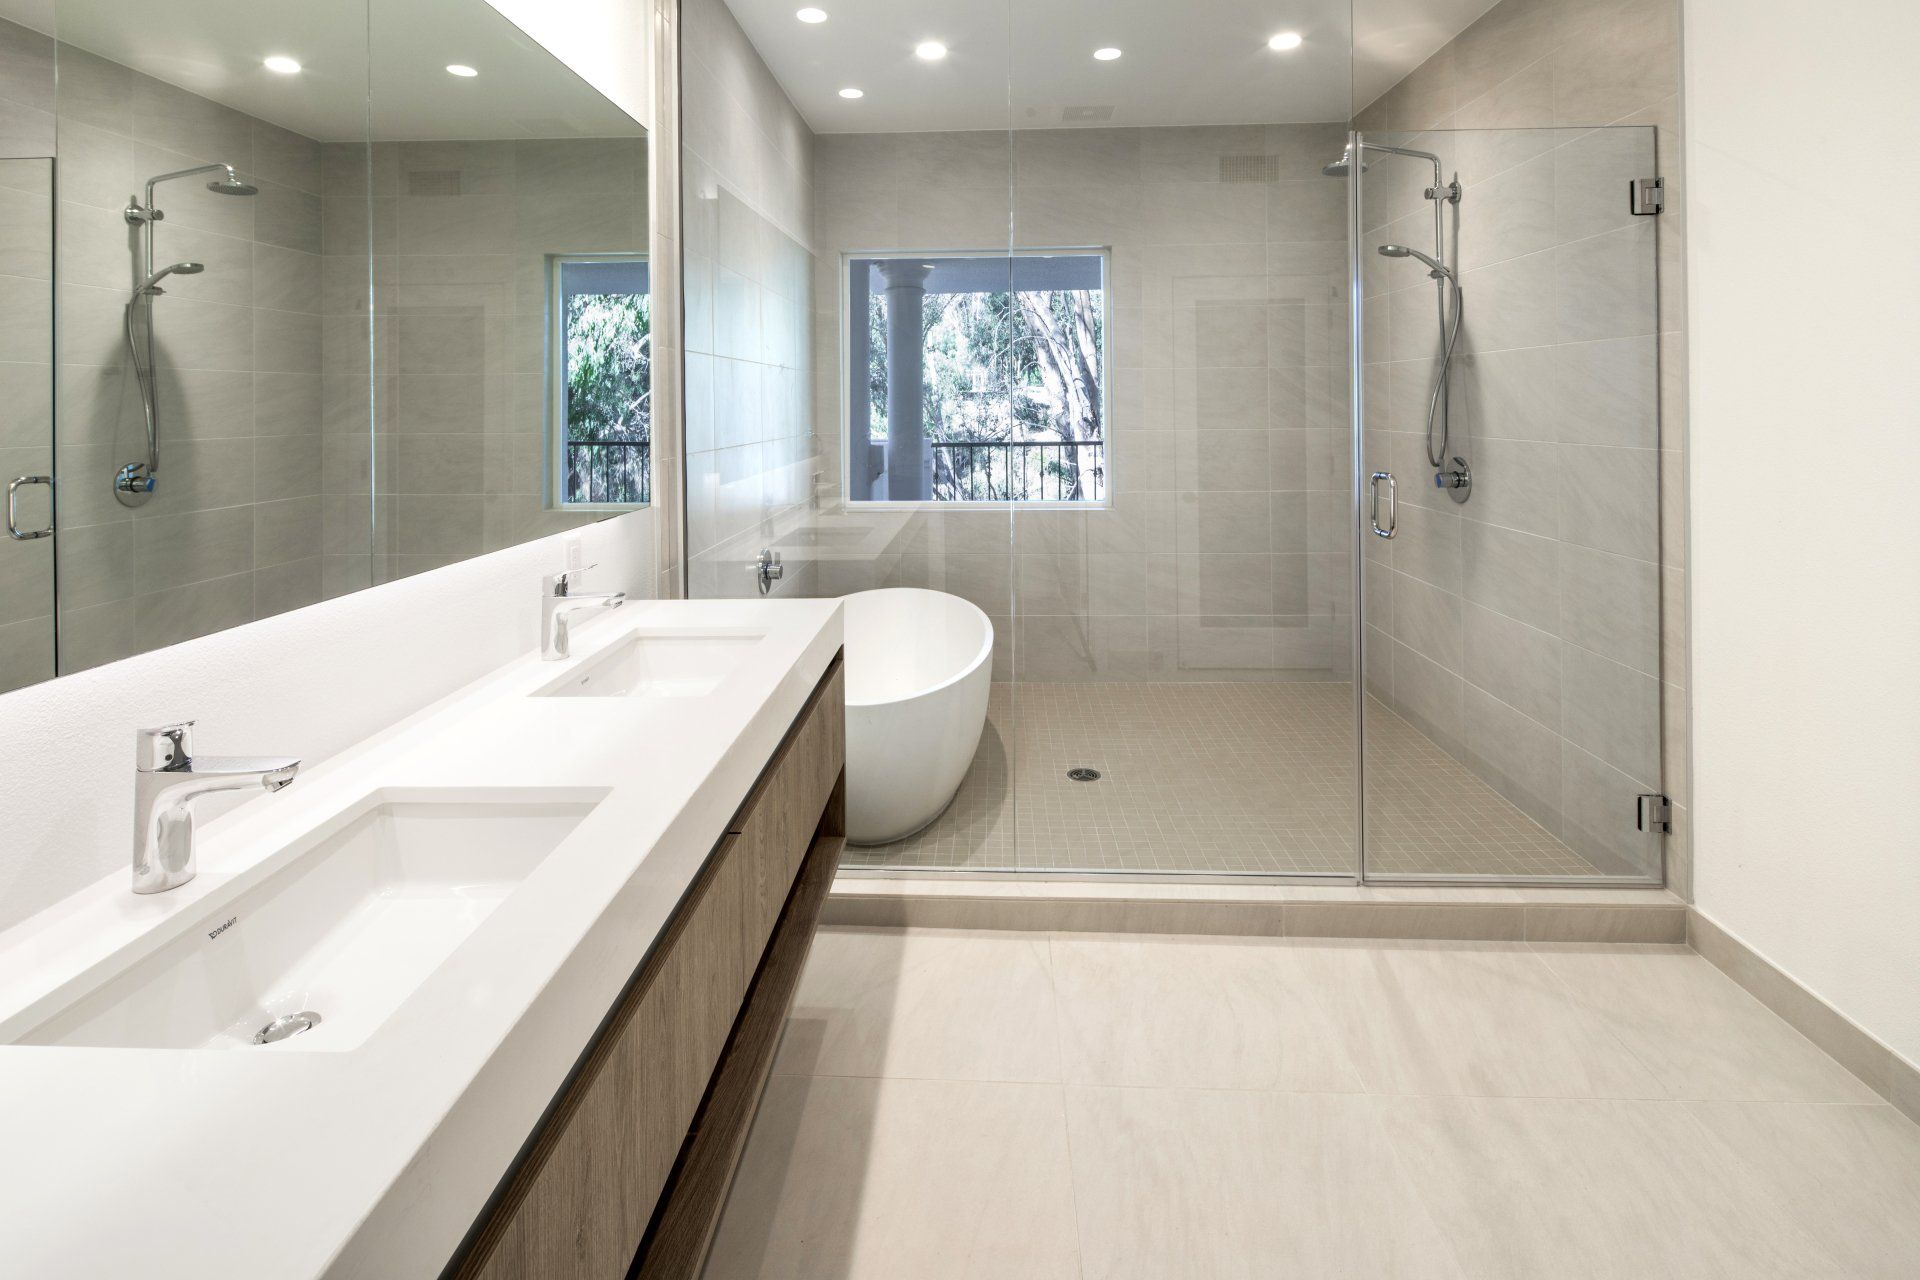 Cavalleri Furnished Housing-Sample Image of Malibu CA Intern Apartments